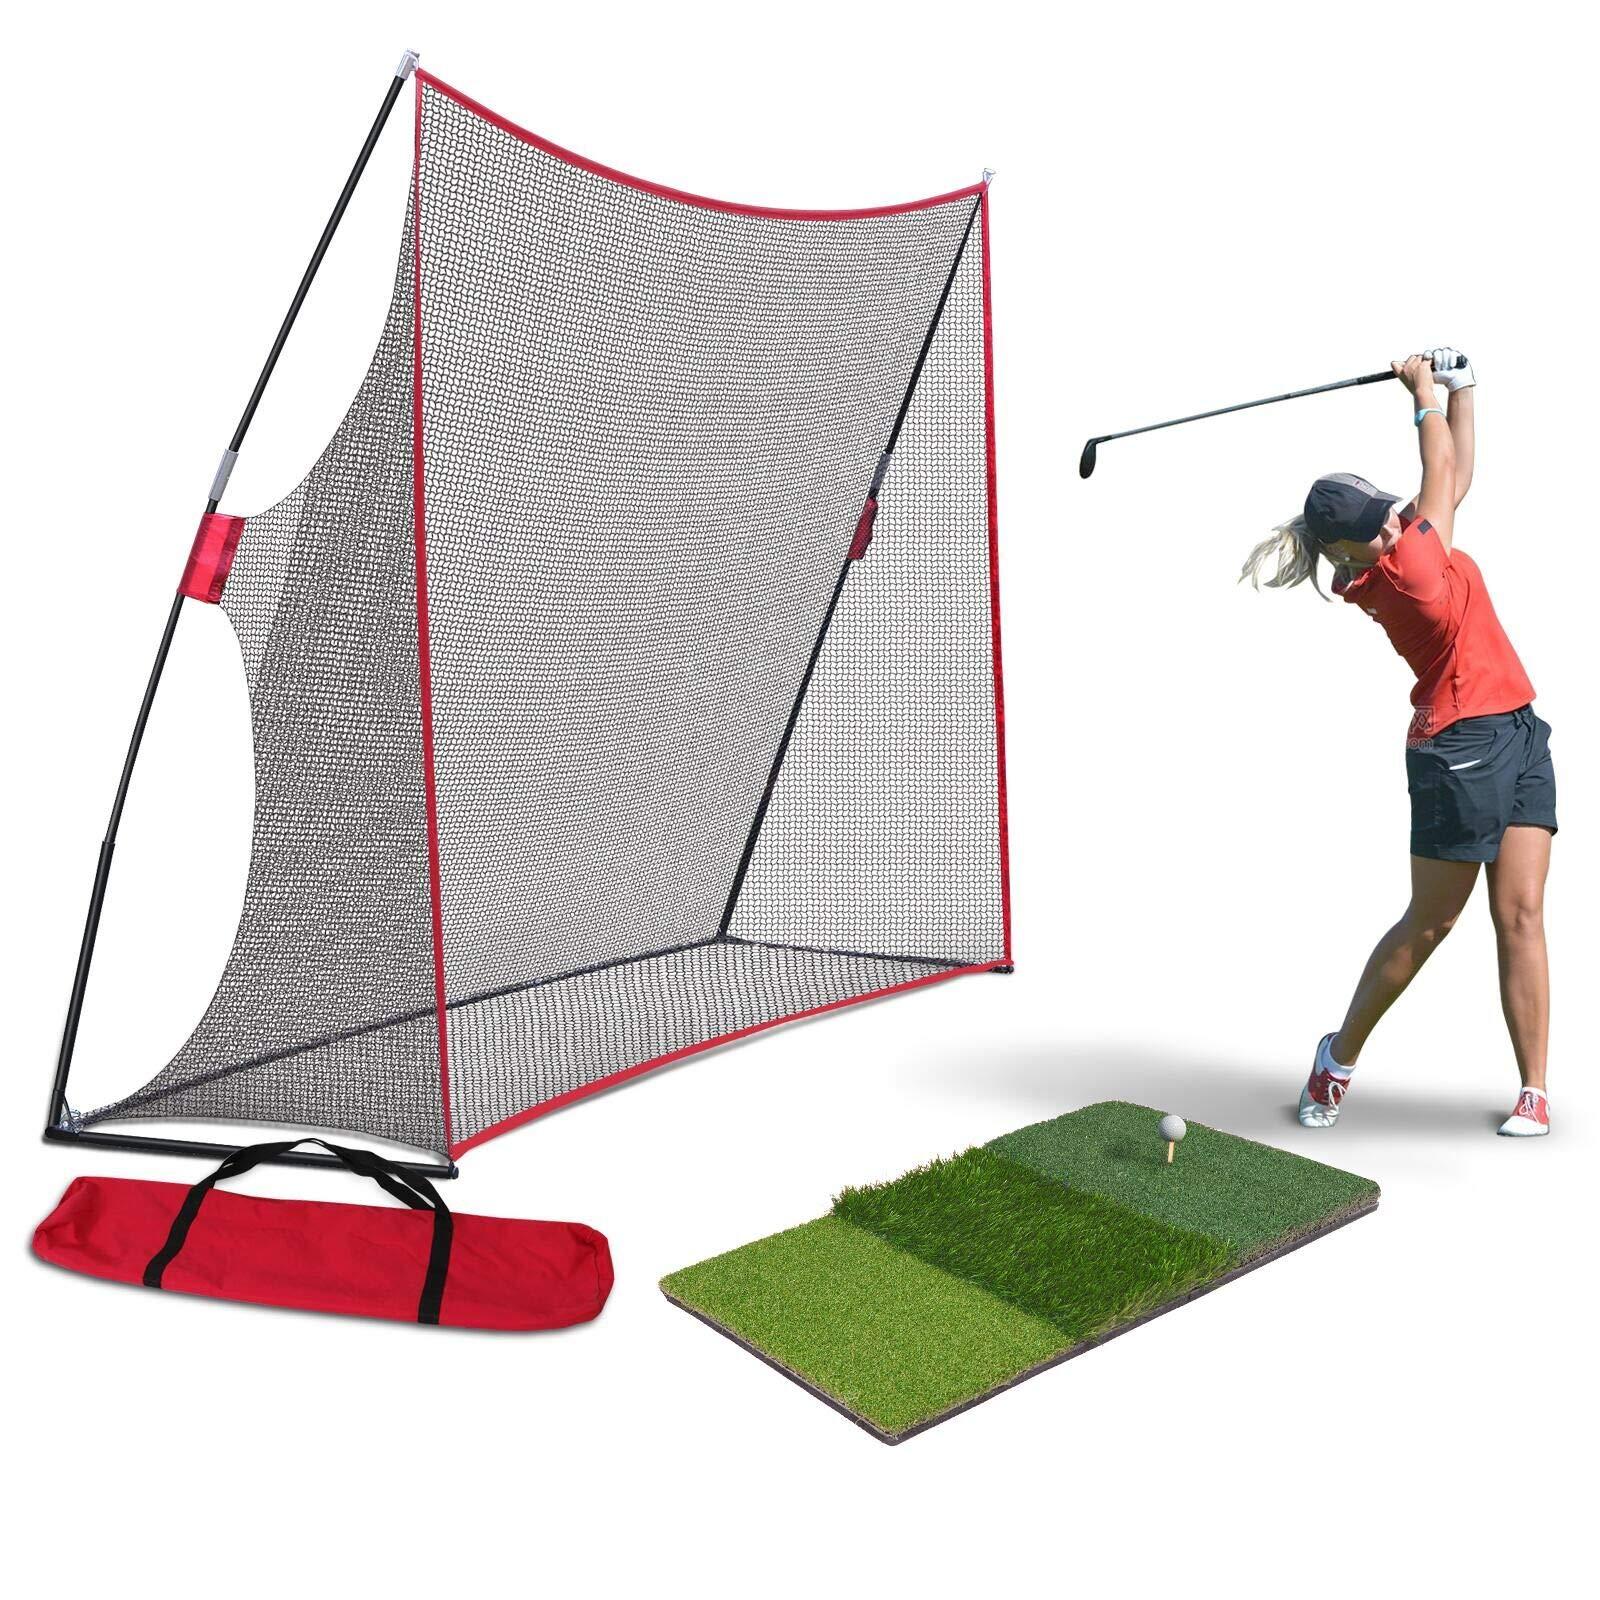 Nova Microdermabrasion Large 10x7ft Portable Golf Net Hitting Net Practice Driving Indoor Outdoor w/Tri-Turf Golf Hitting Grass Mat by Nova Microdermabrasion